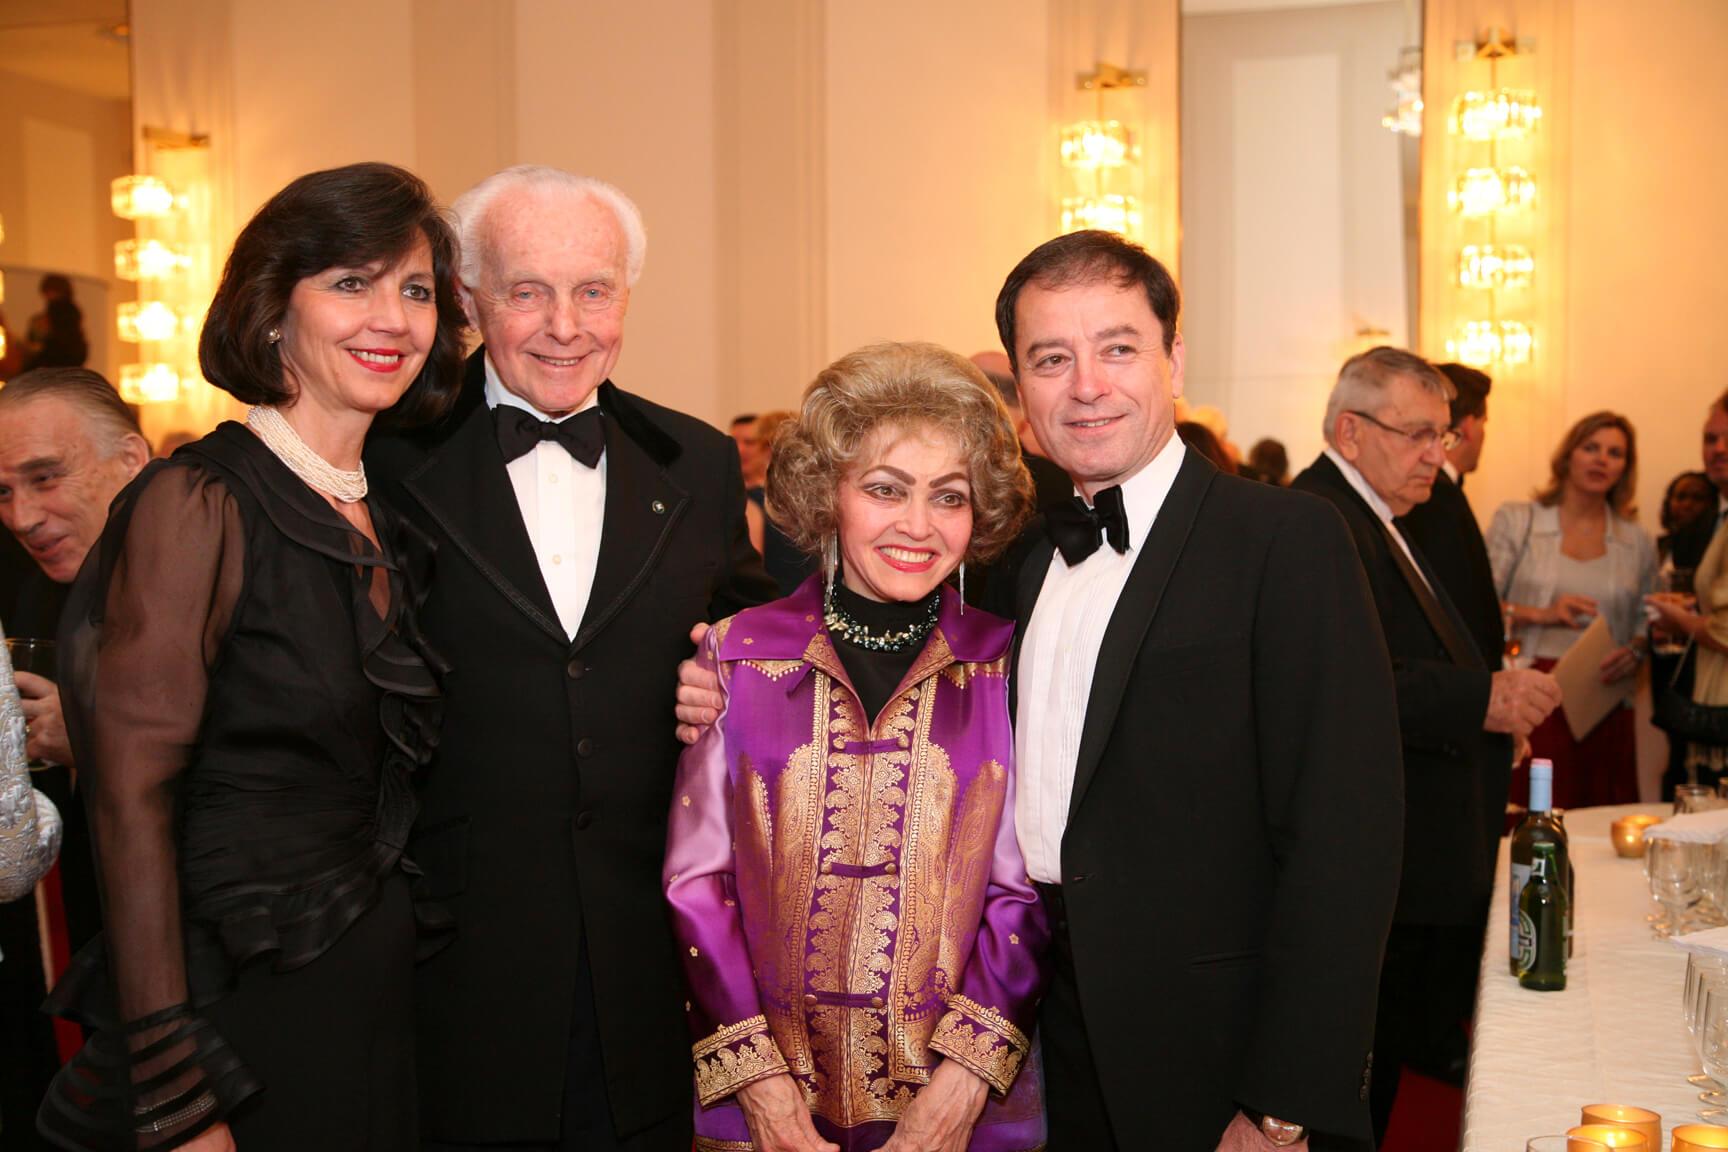 Mrs. Nadja Simonyi, Congressman Tom Lantos, Mrs. Anette Lantos, and Ambassador András Simonyi